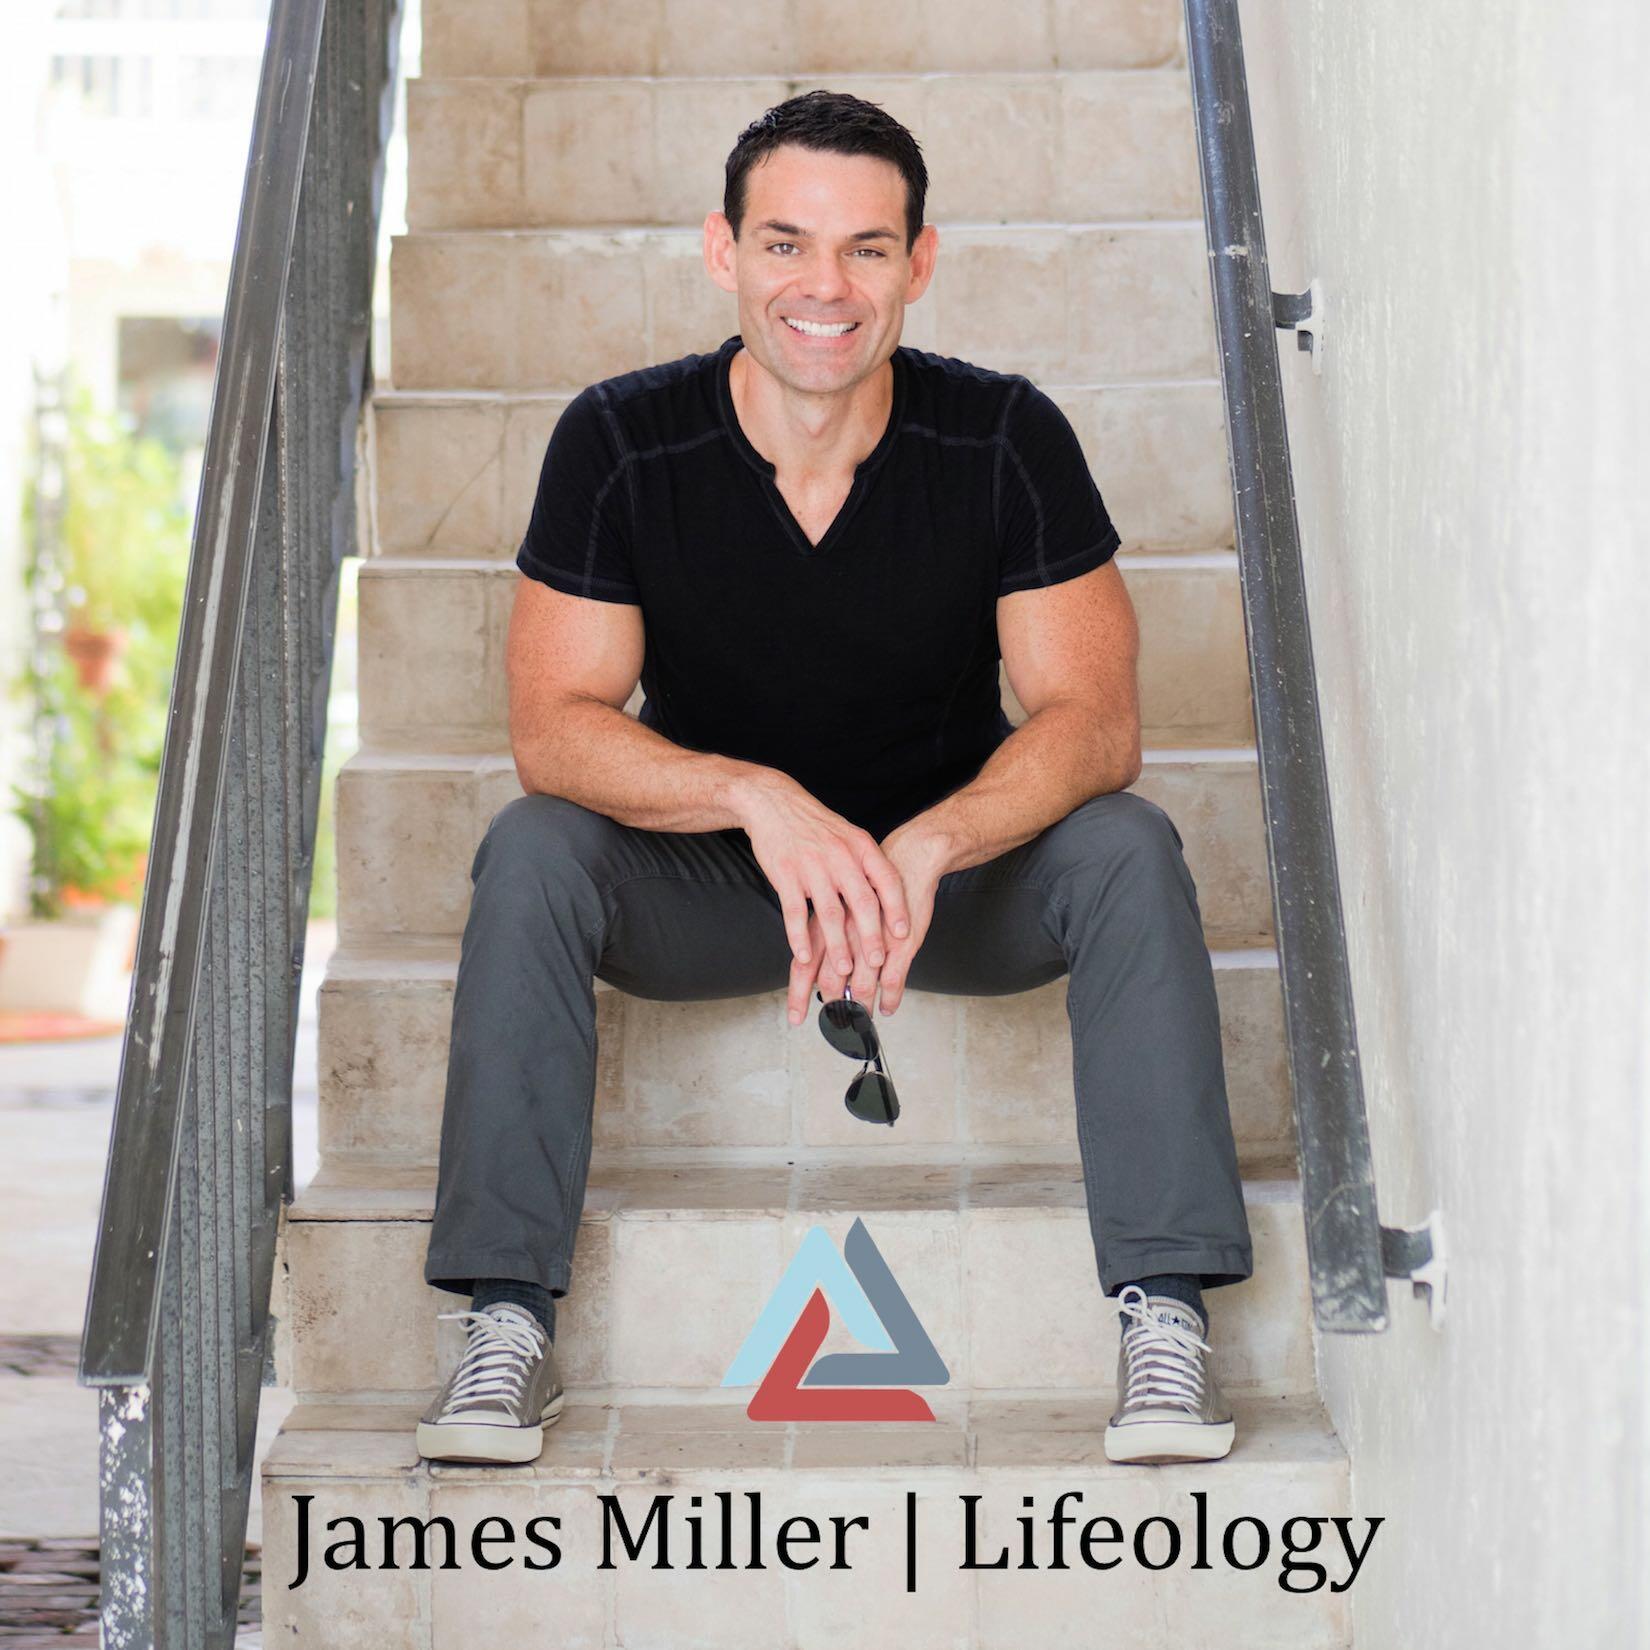 James Miller | LIFEOLOGY®